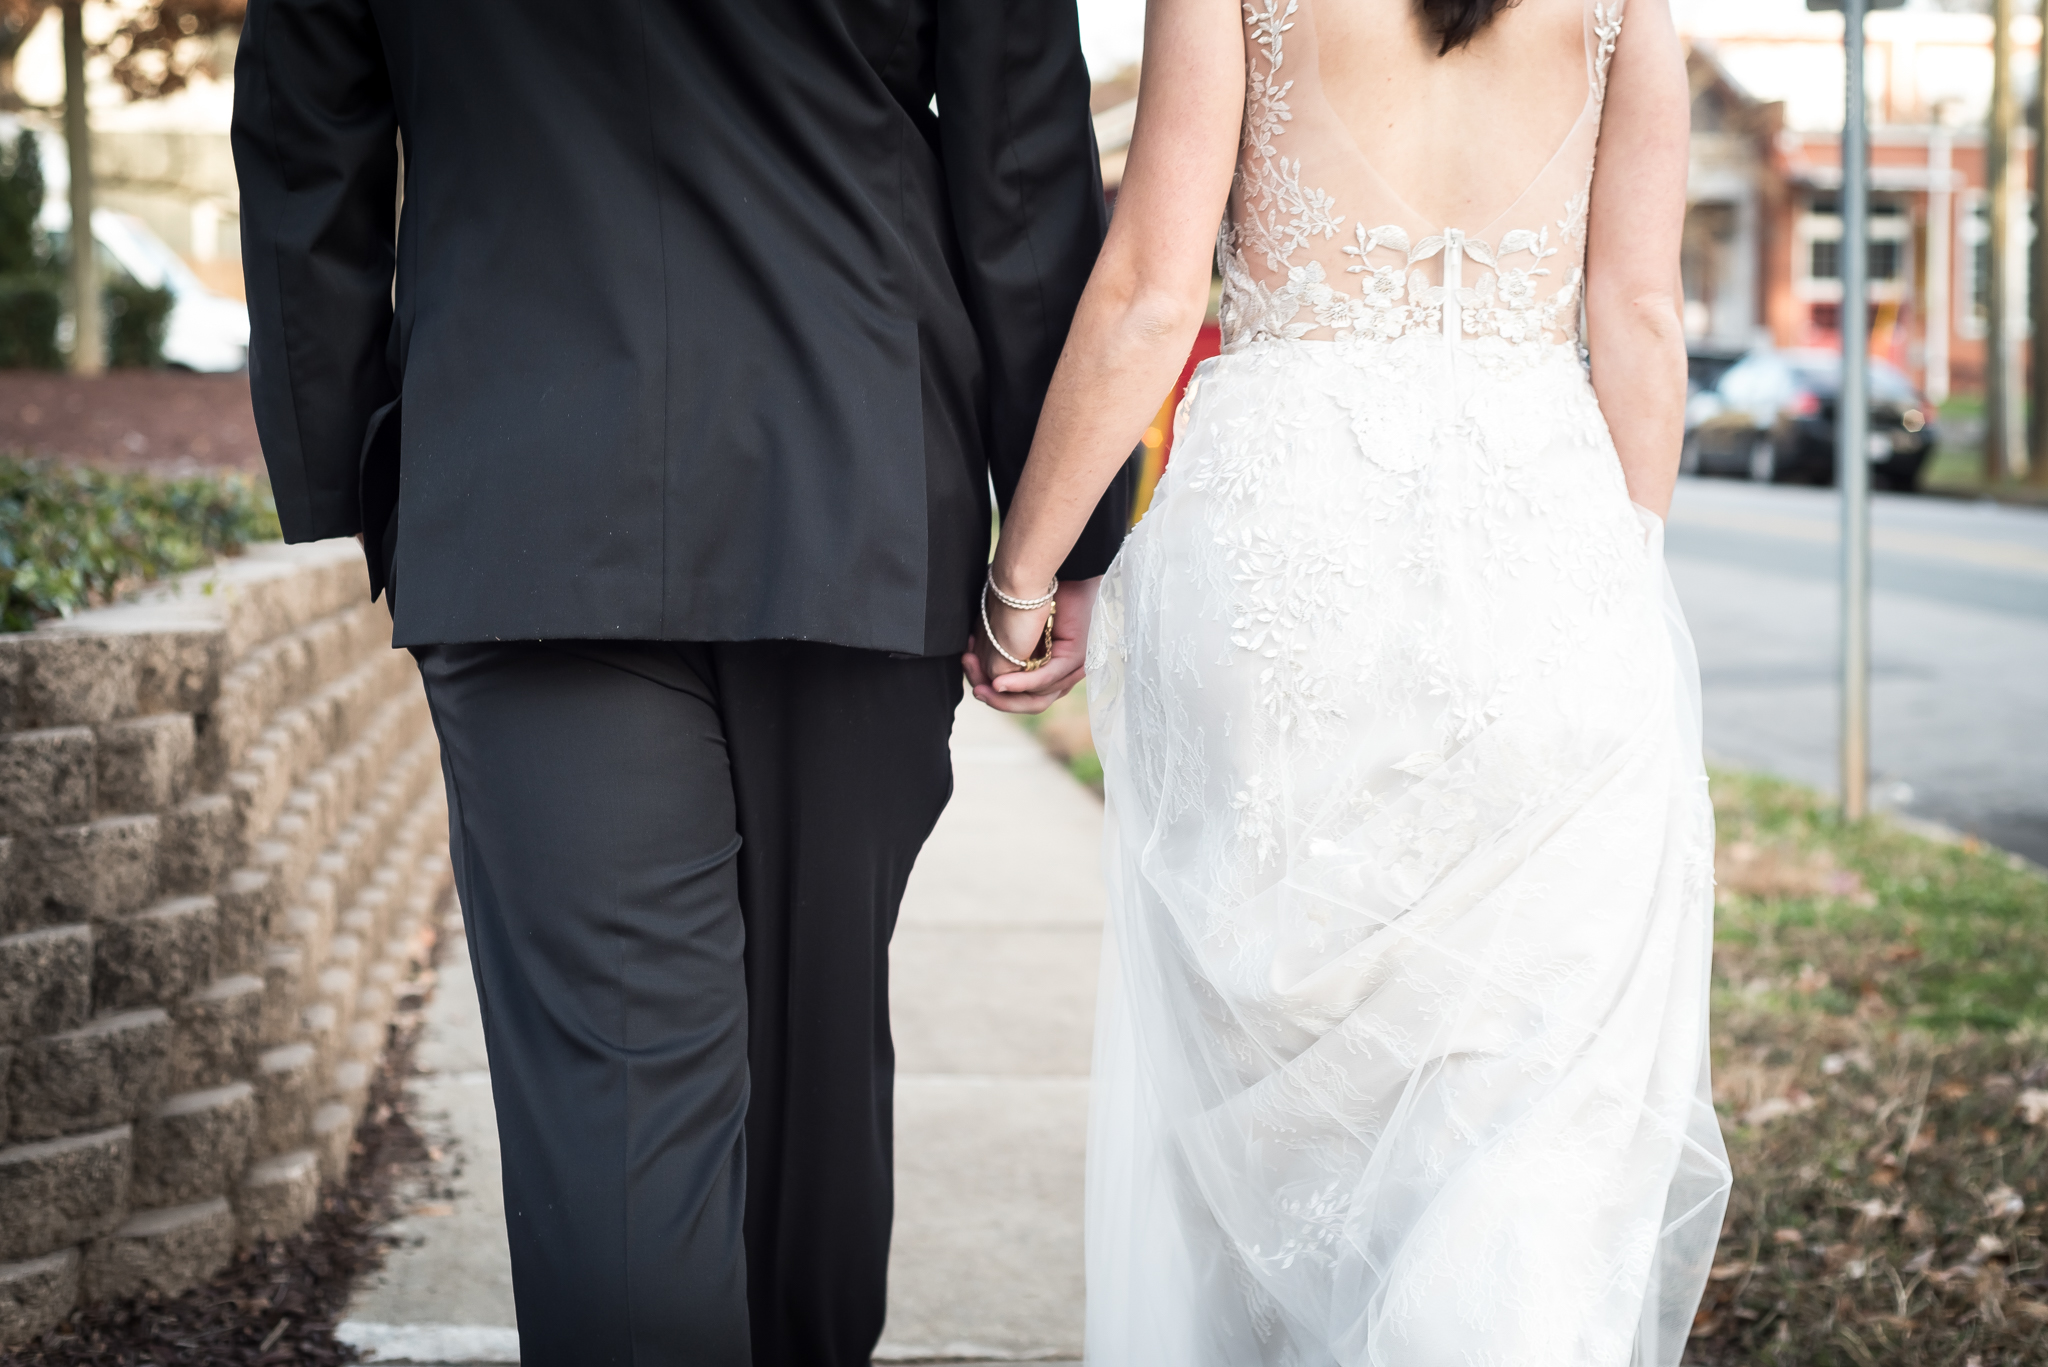 merrimon-wynne-wedding-photography-025.jpg